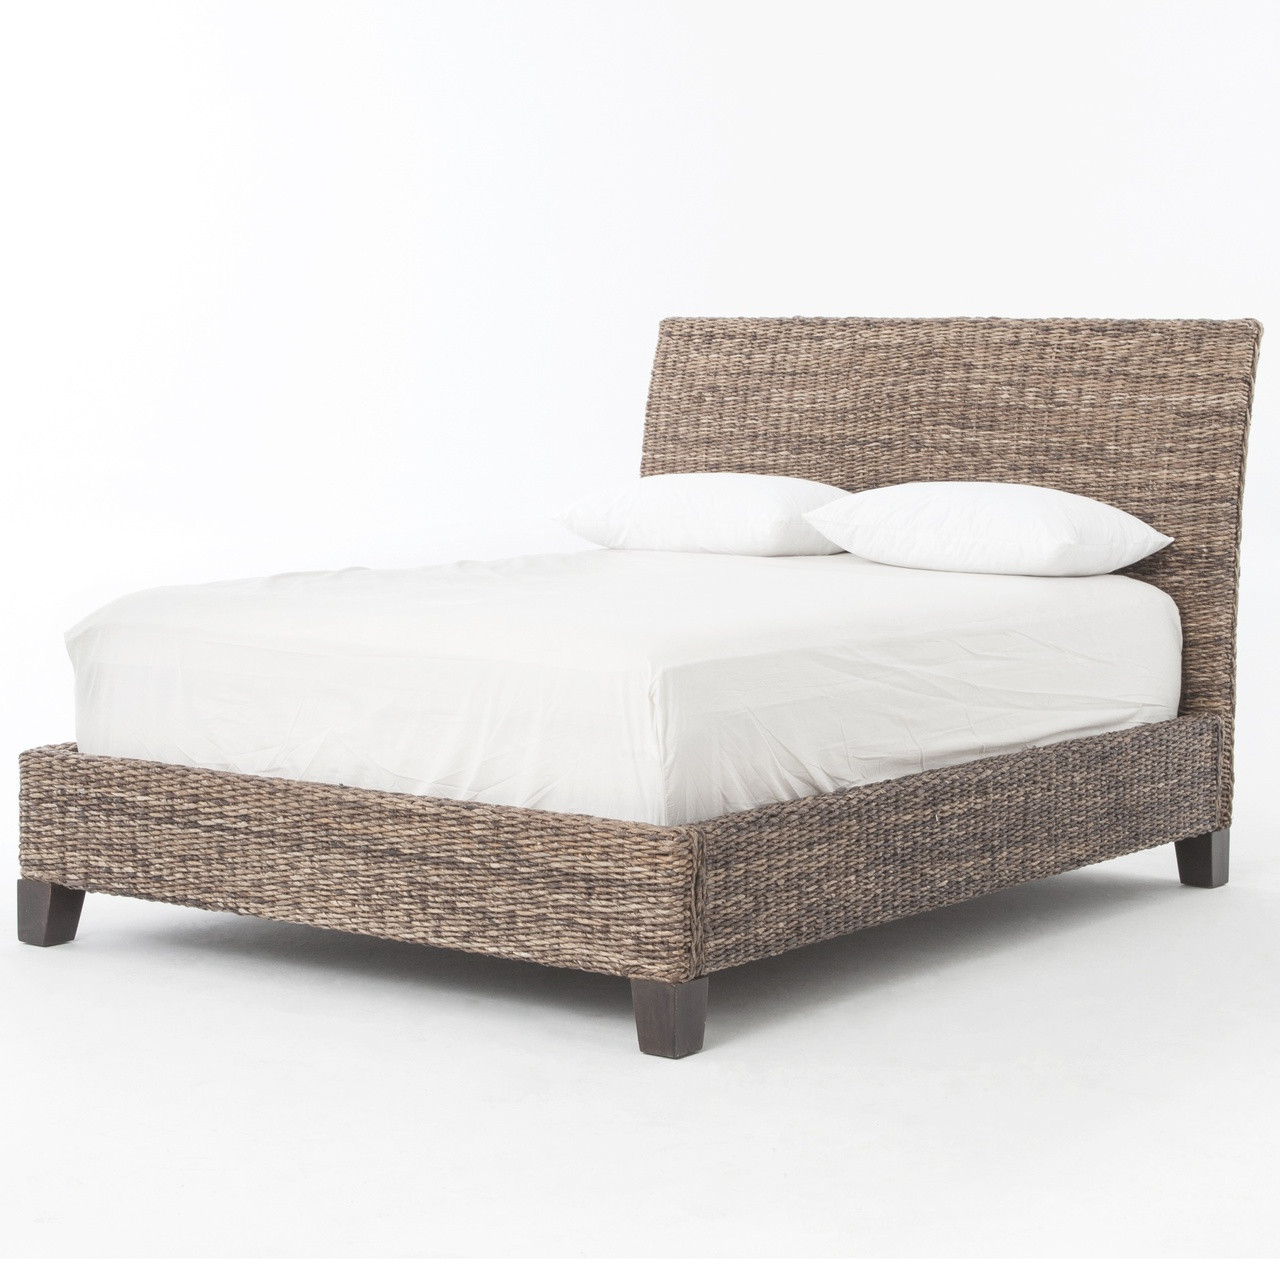 wicker bedroom furniture wicker rattan seagrass furniture zin rh zinhome com seagrass bedroom furniture suppliers